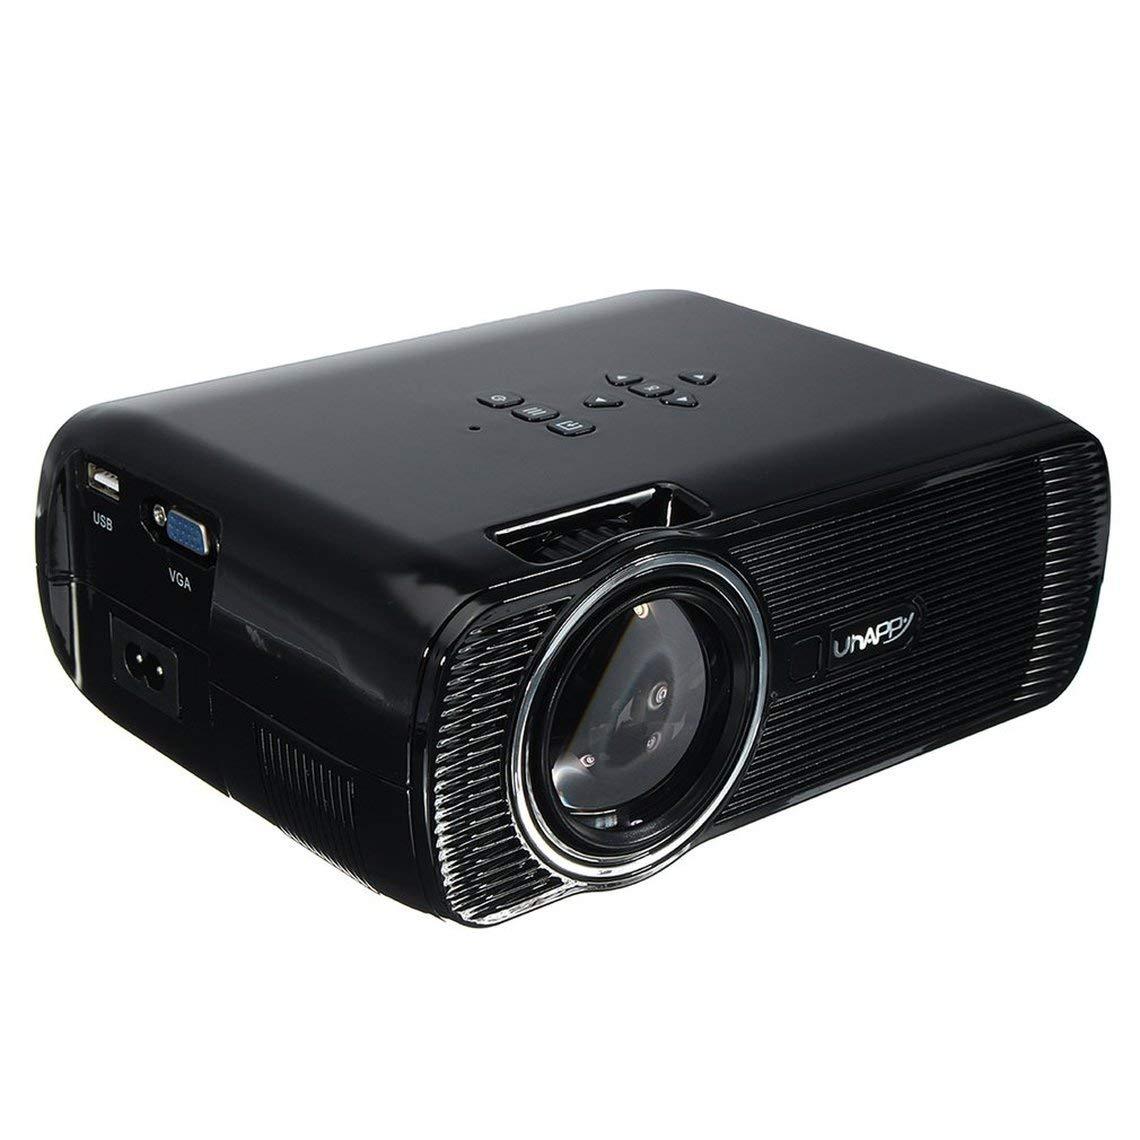 Zinniaya U80 7000 LM Proyector Digital Portátil HD 1080P Proyector ...